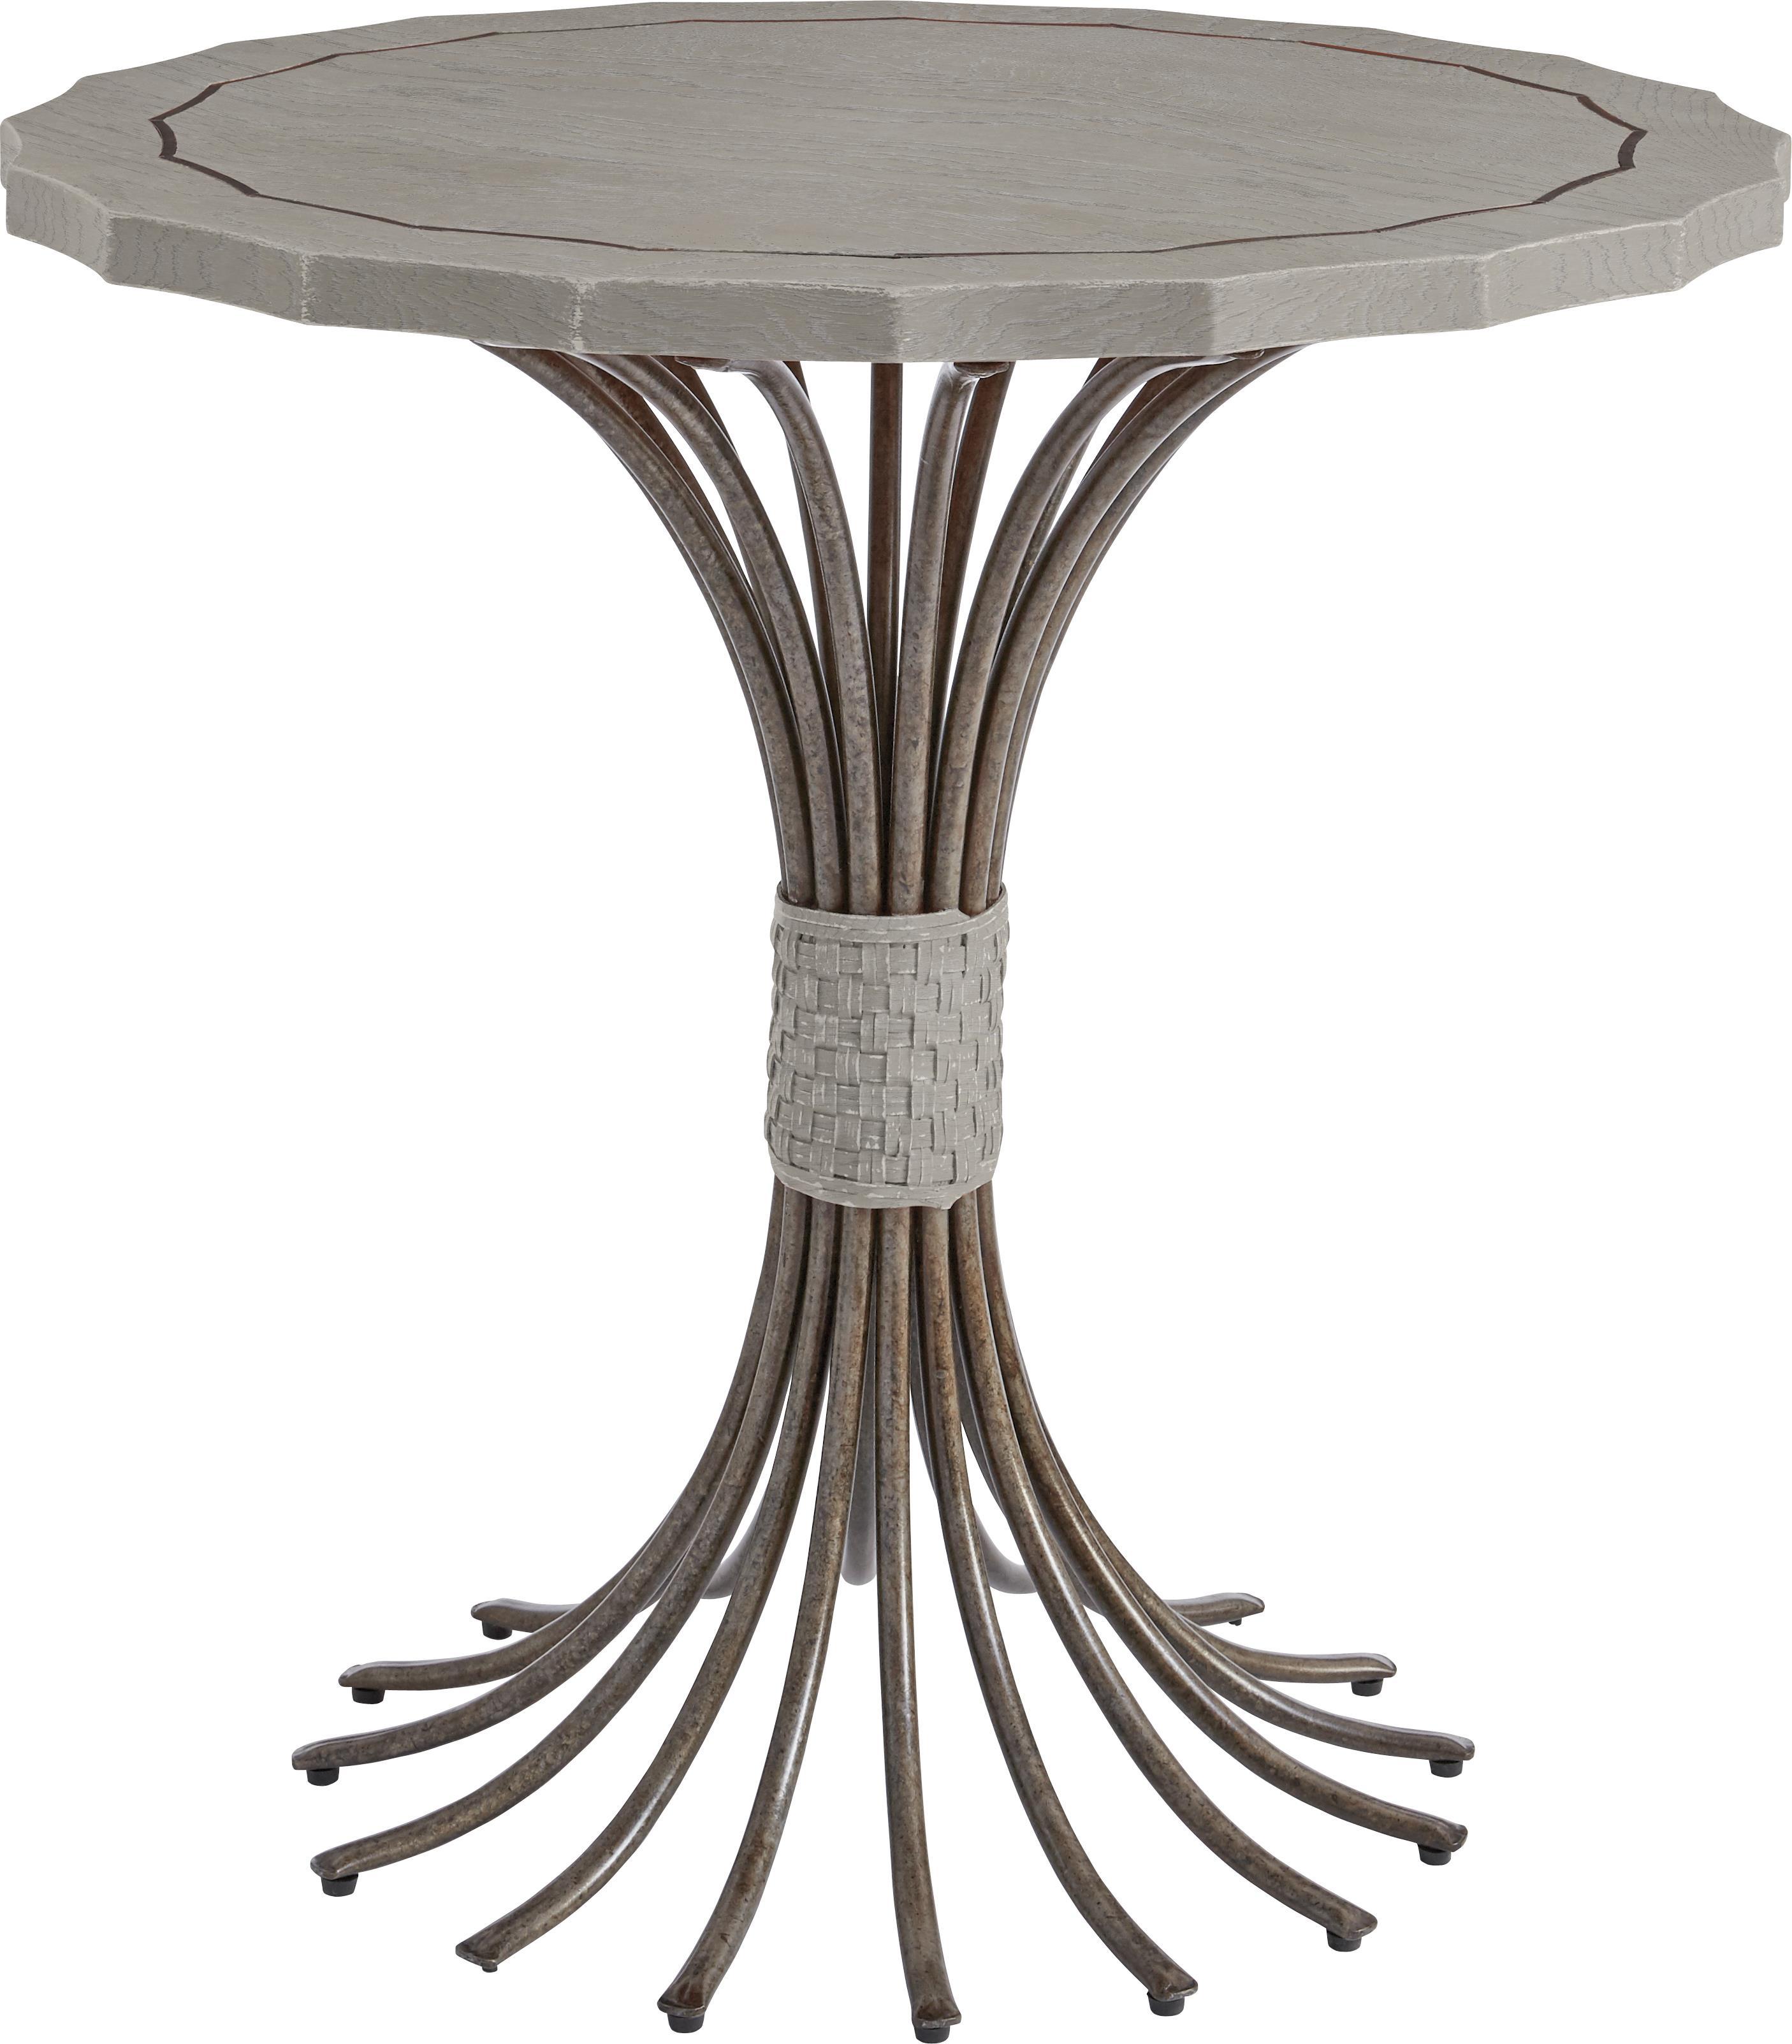 Stanley Furniture Coastal Living Resort Eddy's Landing Lamp Table - Item Number: 062-C5-08